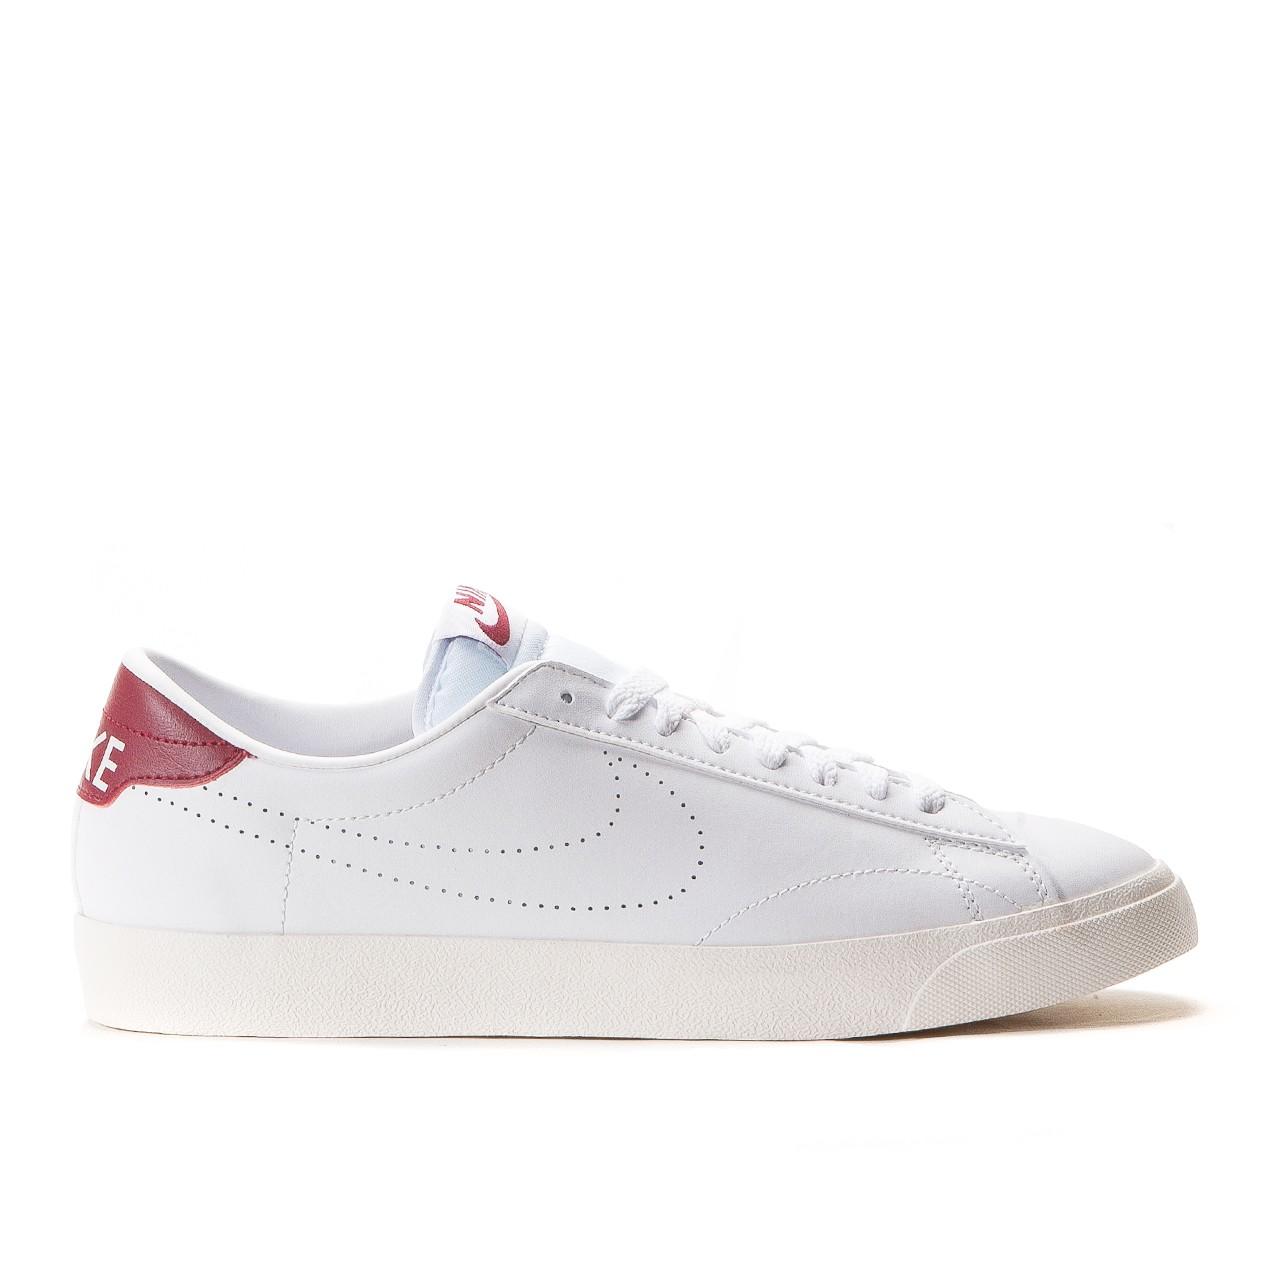 Nike Tennis Classic AC (White Chianti) ac35d2b6c0c7